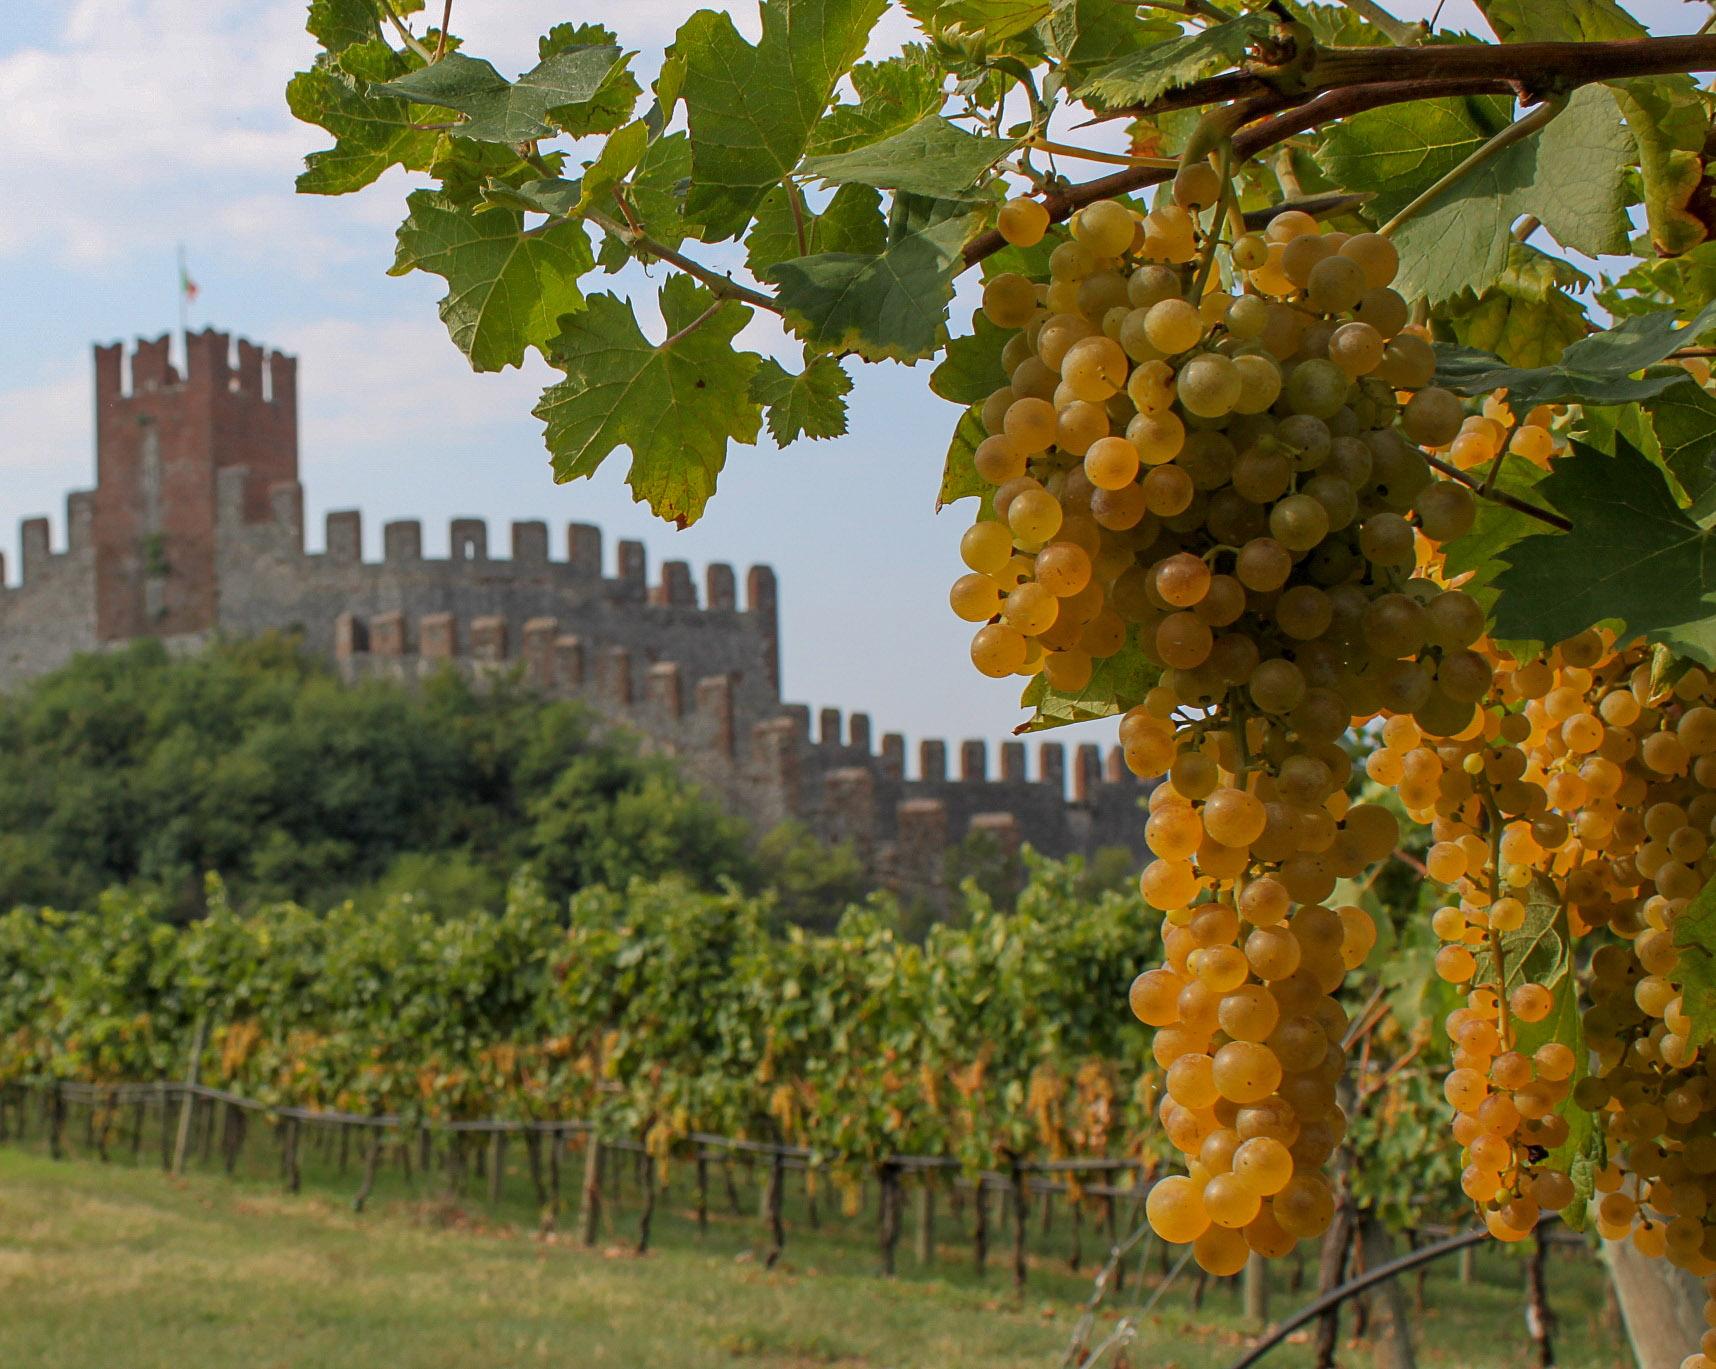 Castello di Soave | ©John Szabo (published by Jacqui Small)